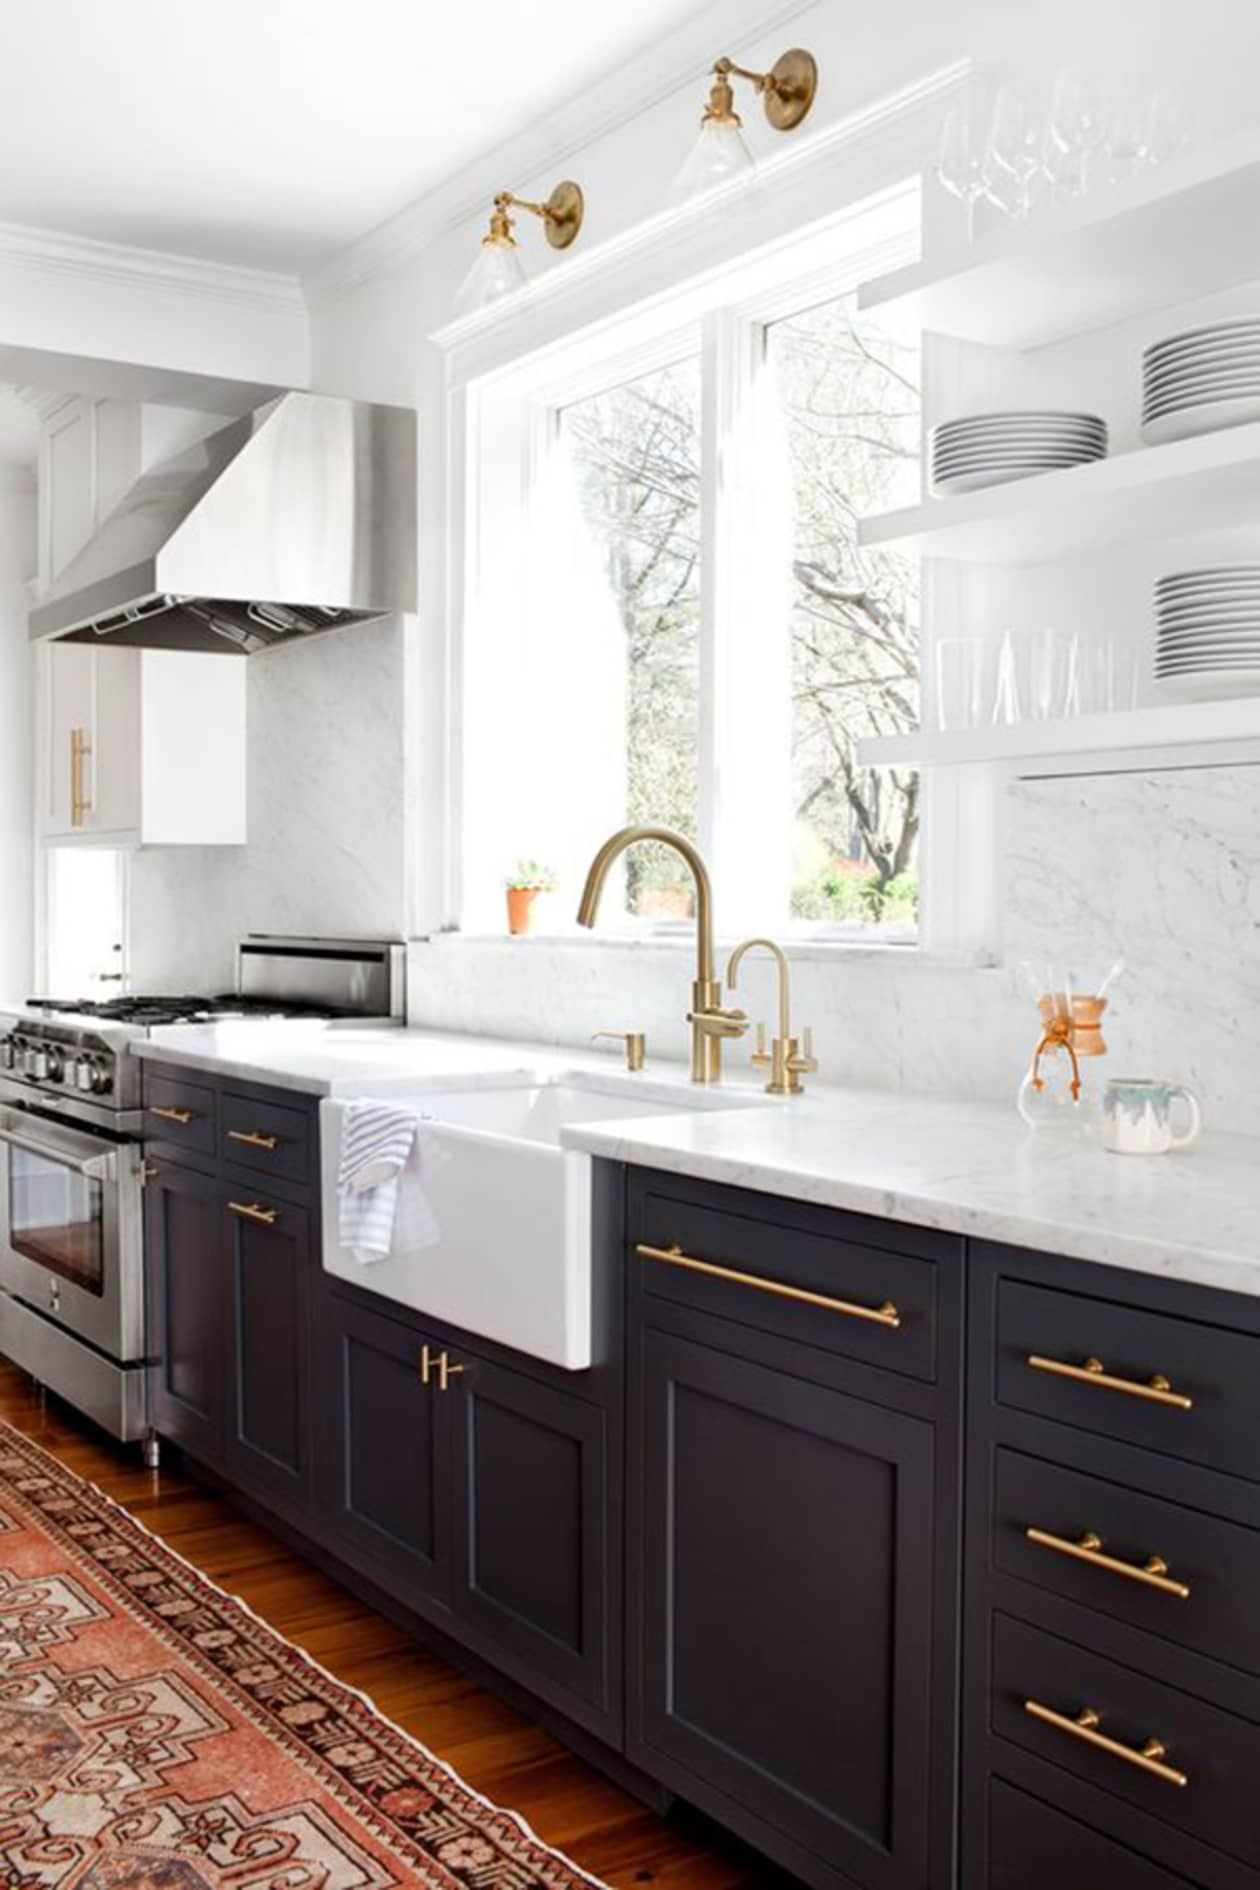 All About That Brass A Kitchen Hardware Shopping Guide Kitchen Cabinets Kitchen Cabinet Remodel Best Kitchen Cabinets